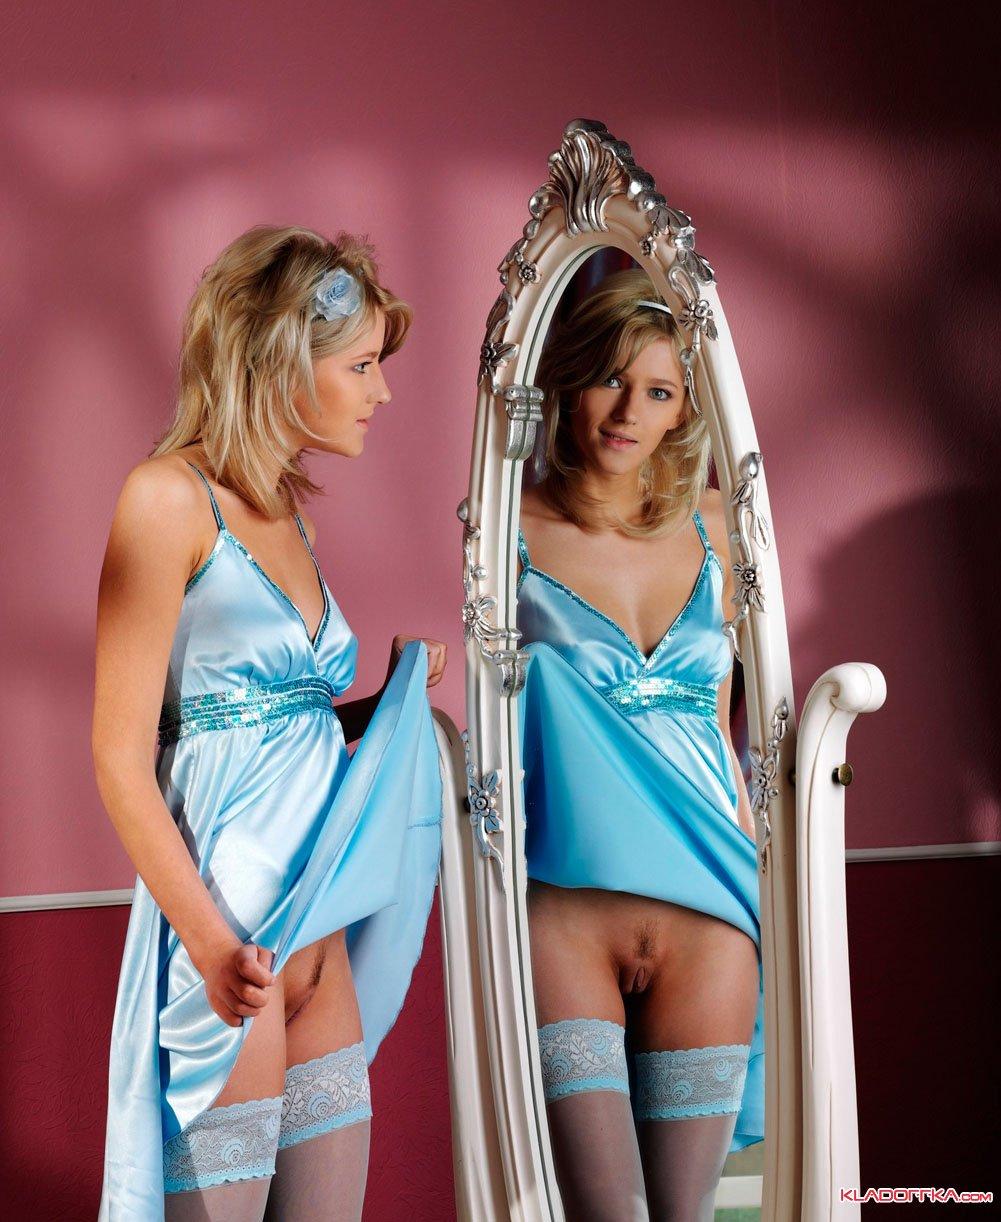 Перед зеркалом порнушка